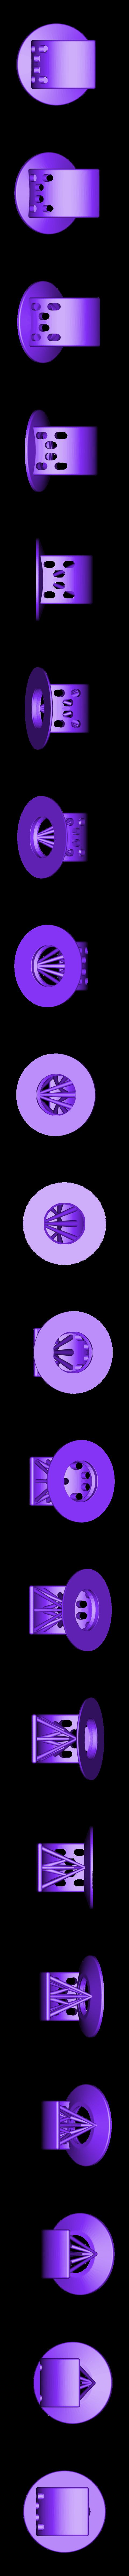 Bug_Catcher_2.stl Download free STL file Food Survival Clinic • 3D print template, Raeunn3D